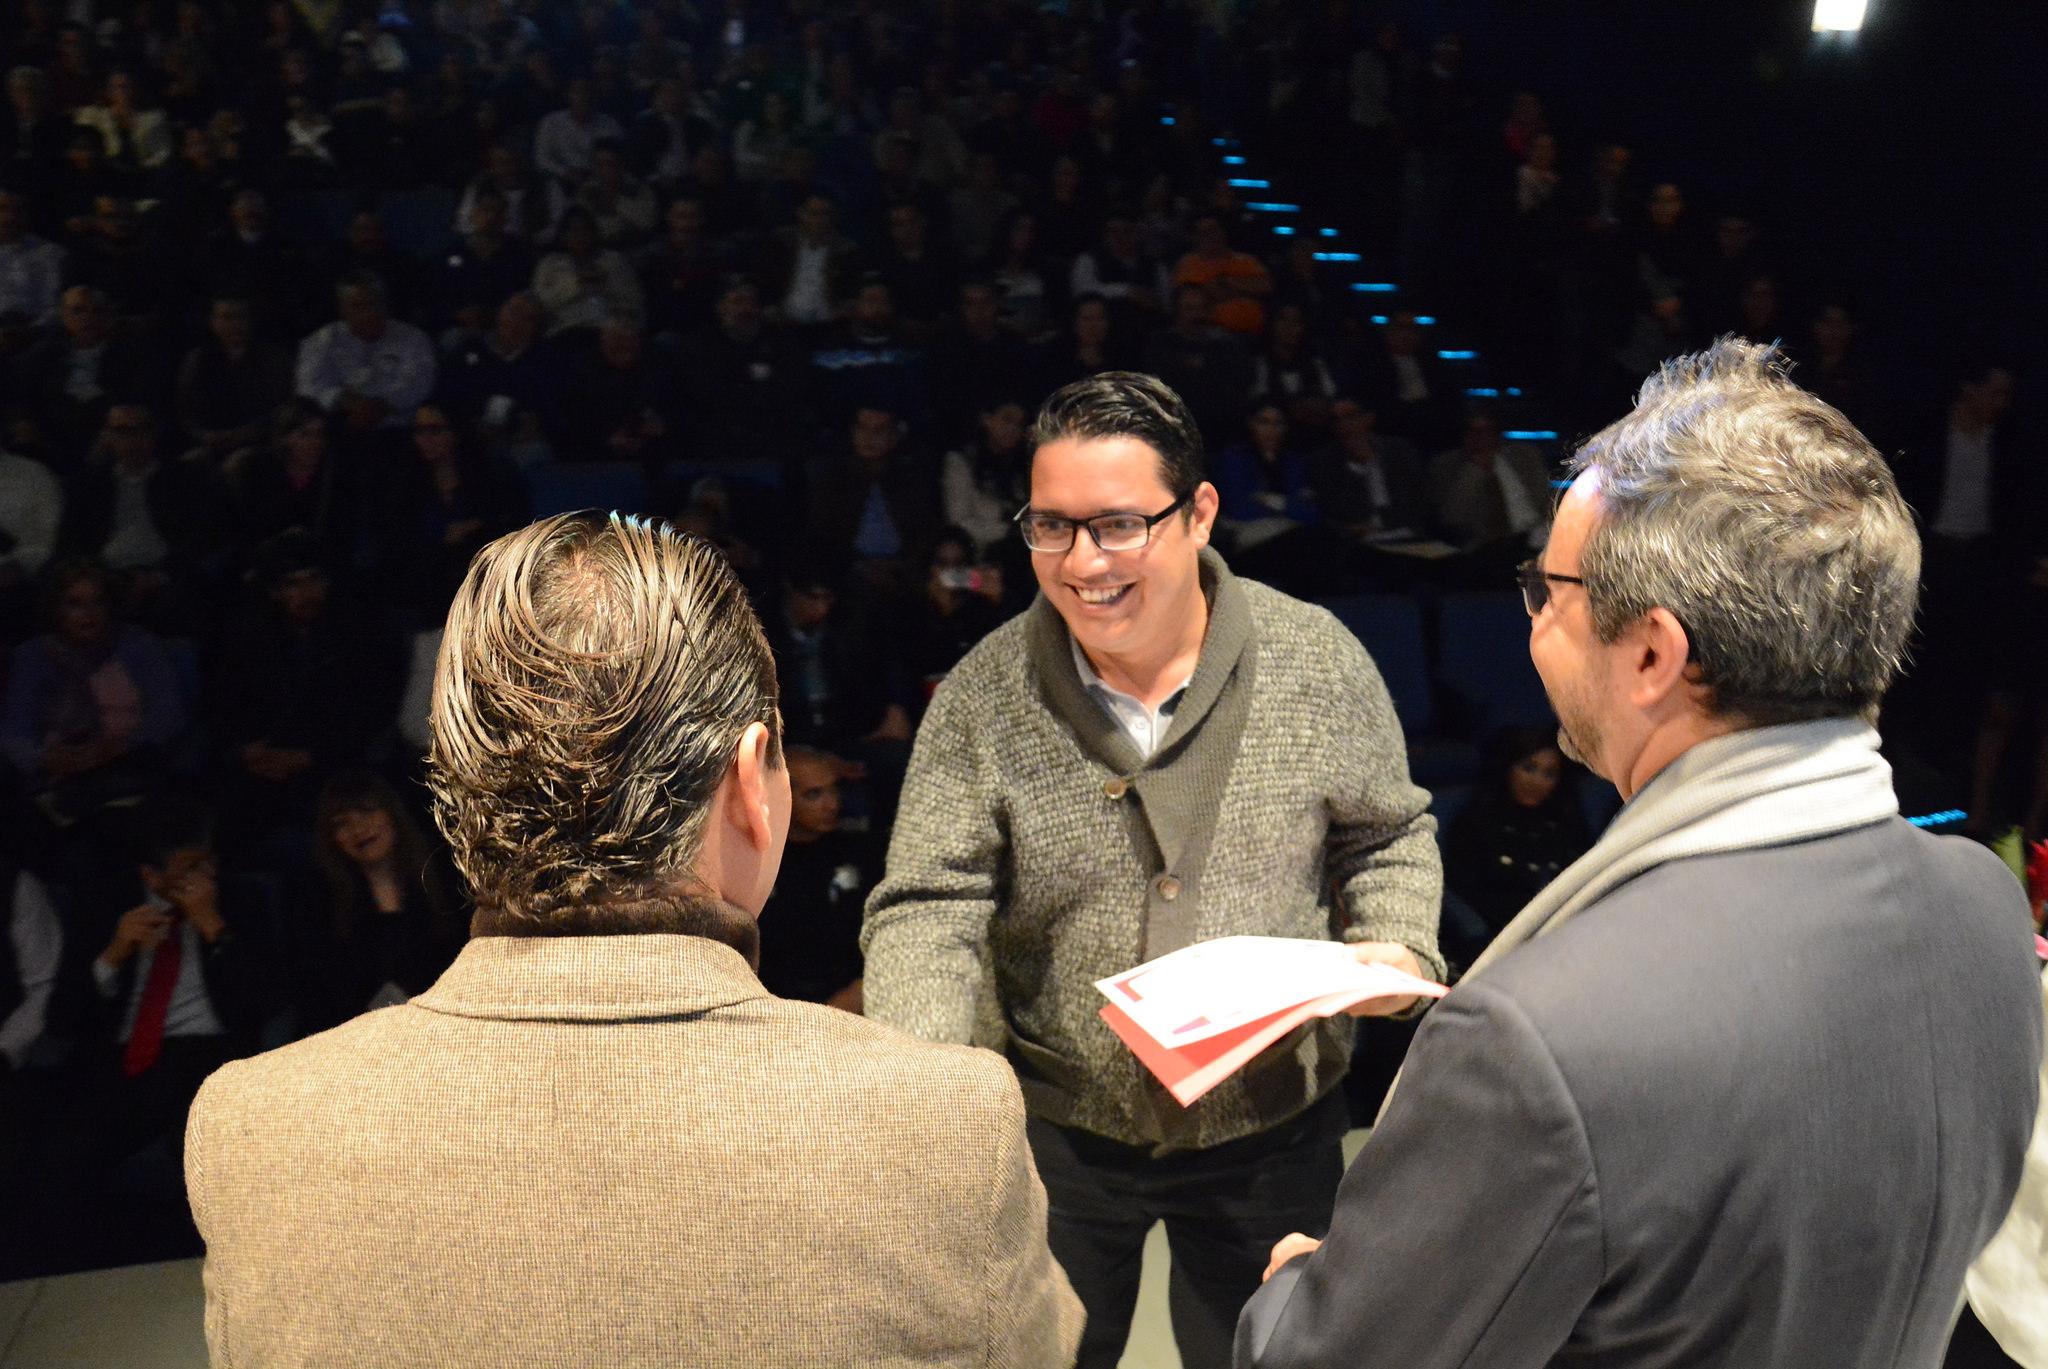 Pablo Lemus encabeza entrega de constancias de Formación Institucional a Servidores Públicos